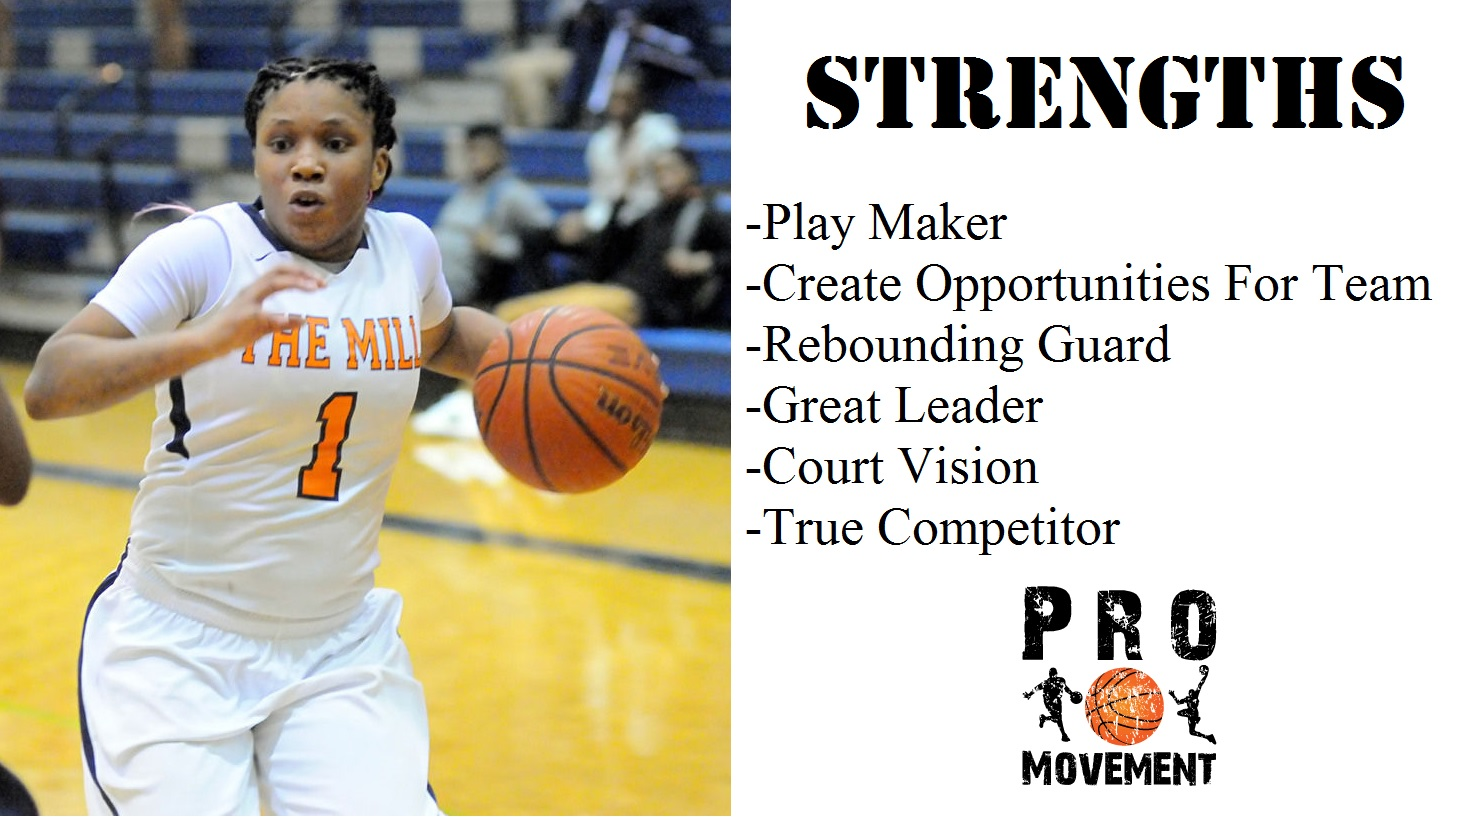 Kiara Strengths